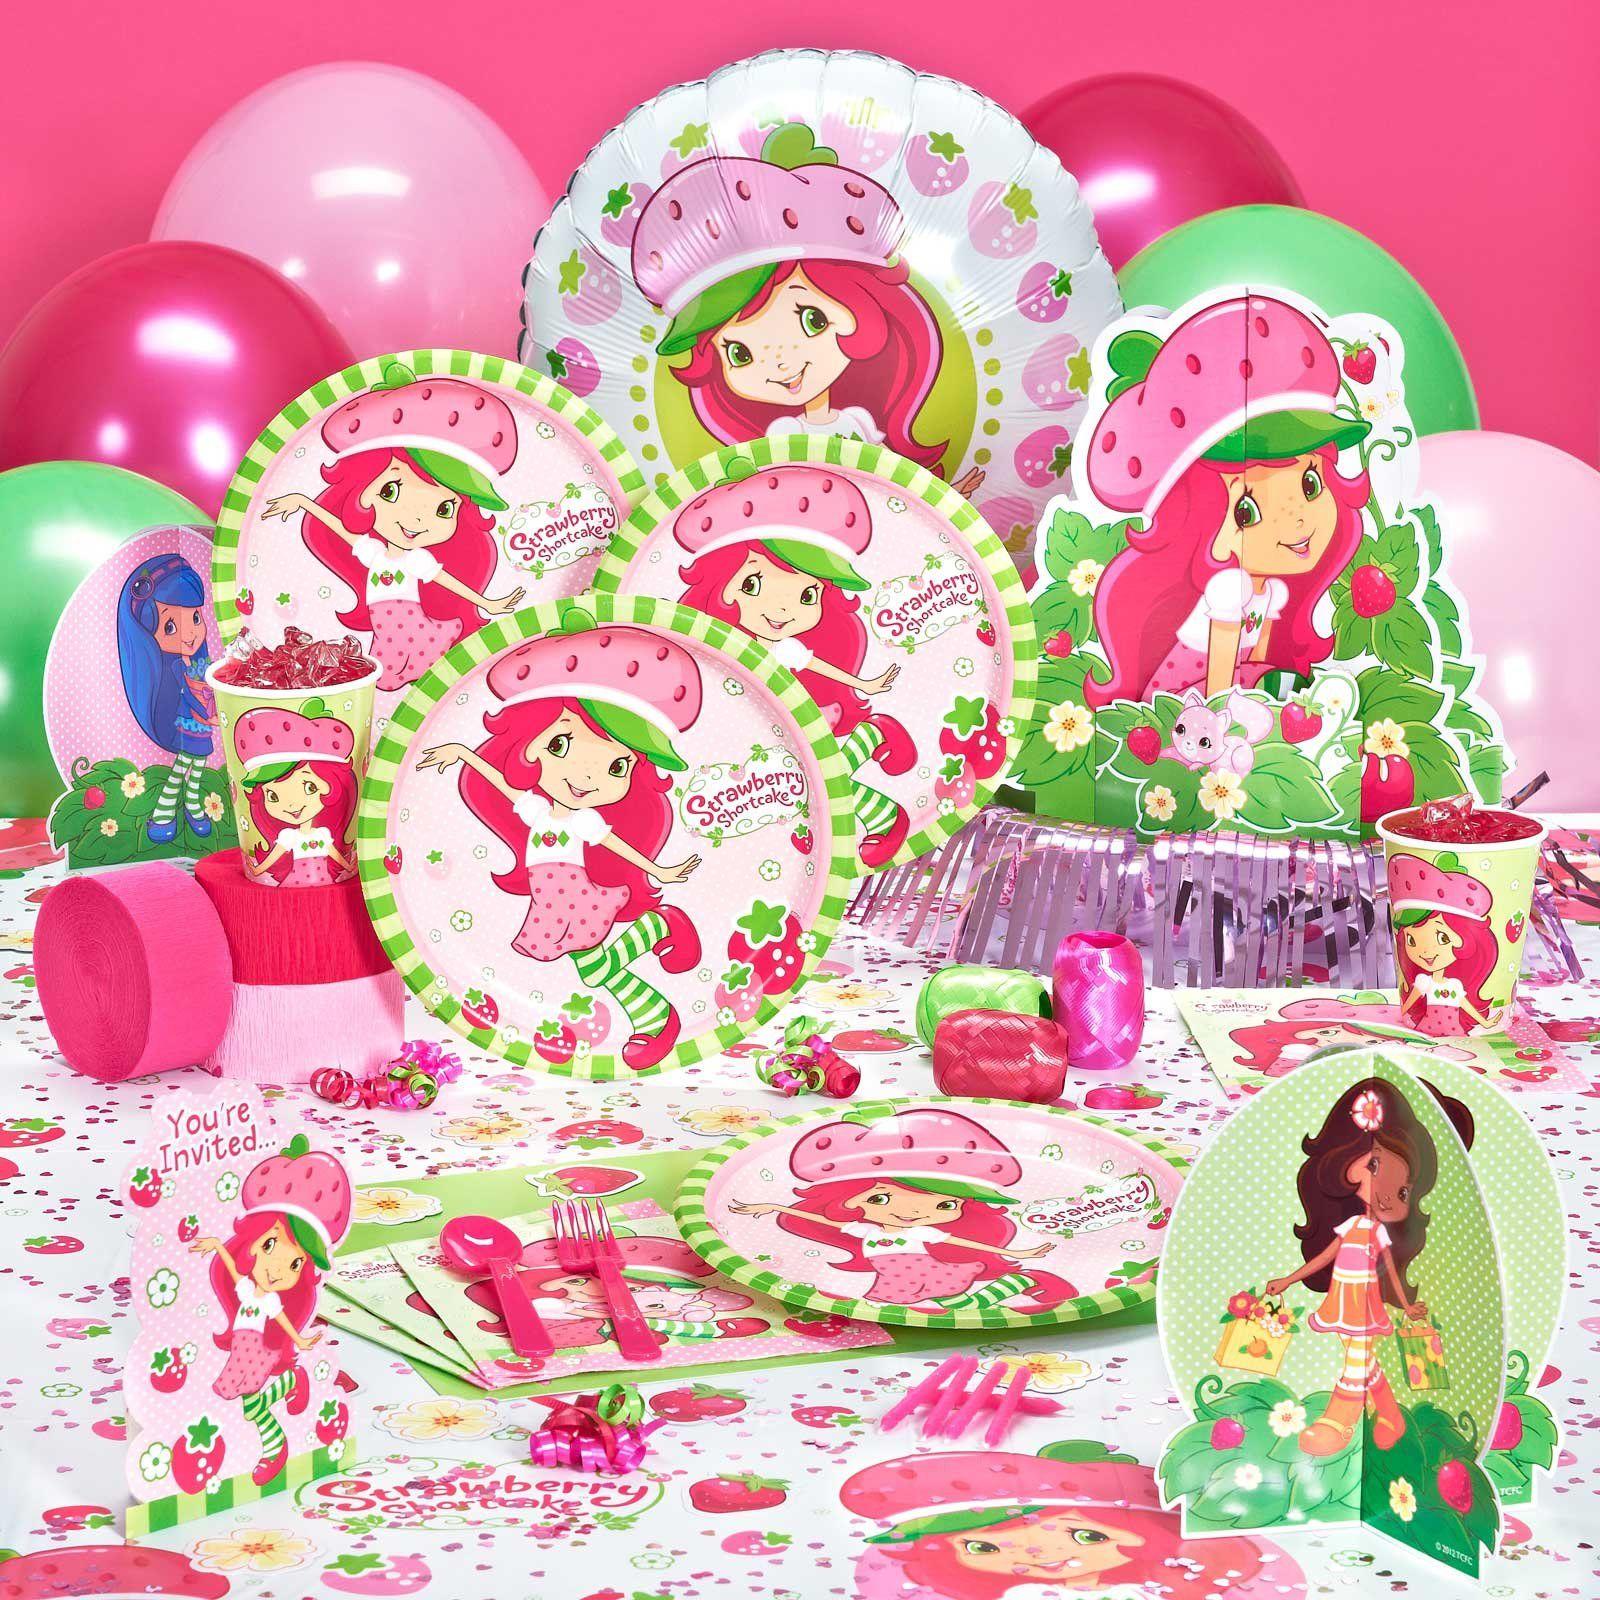 Strawberry Shortcake Birthday Party Supplies